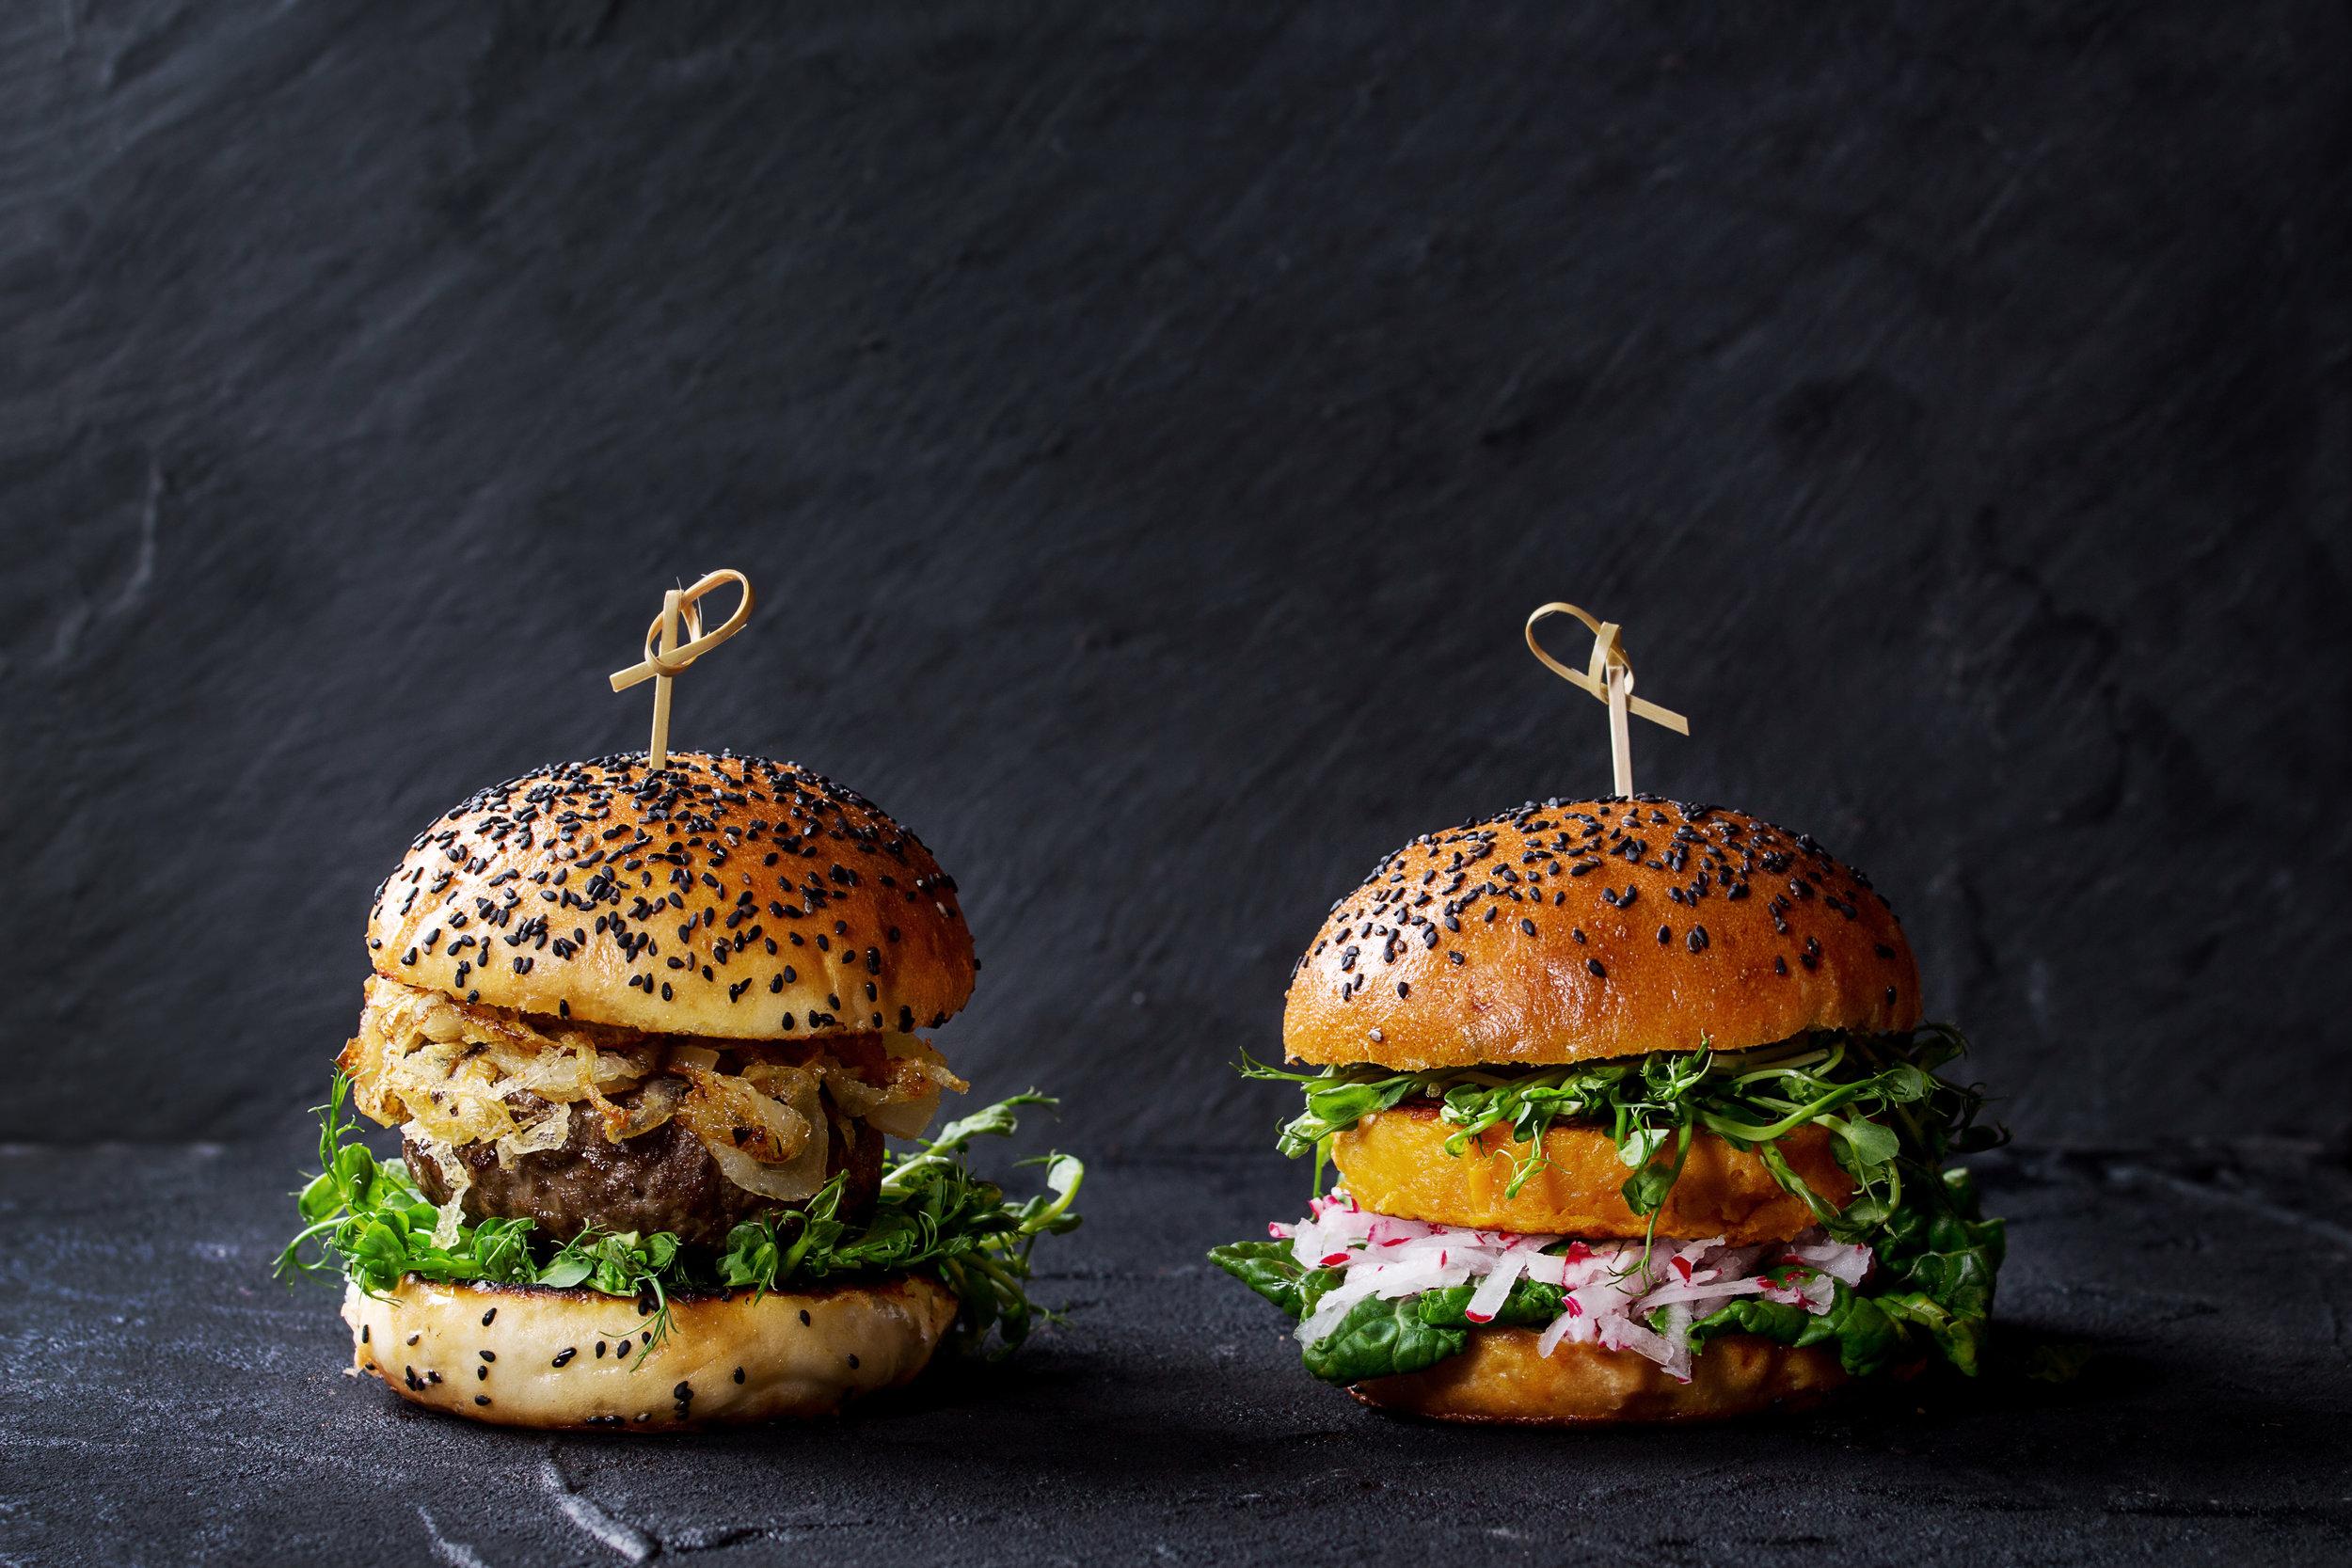 Vegan nutrition - vegan and vegetarian diets have loads of health benefits